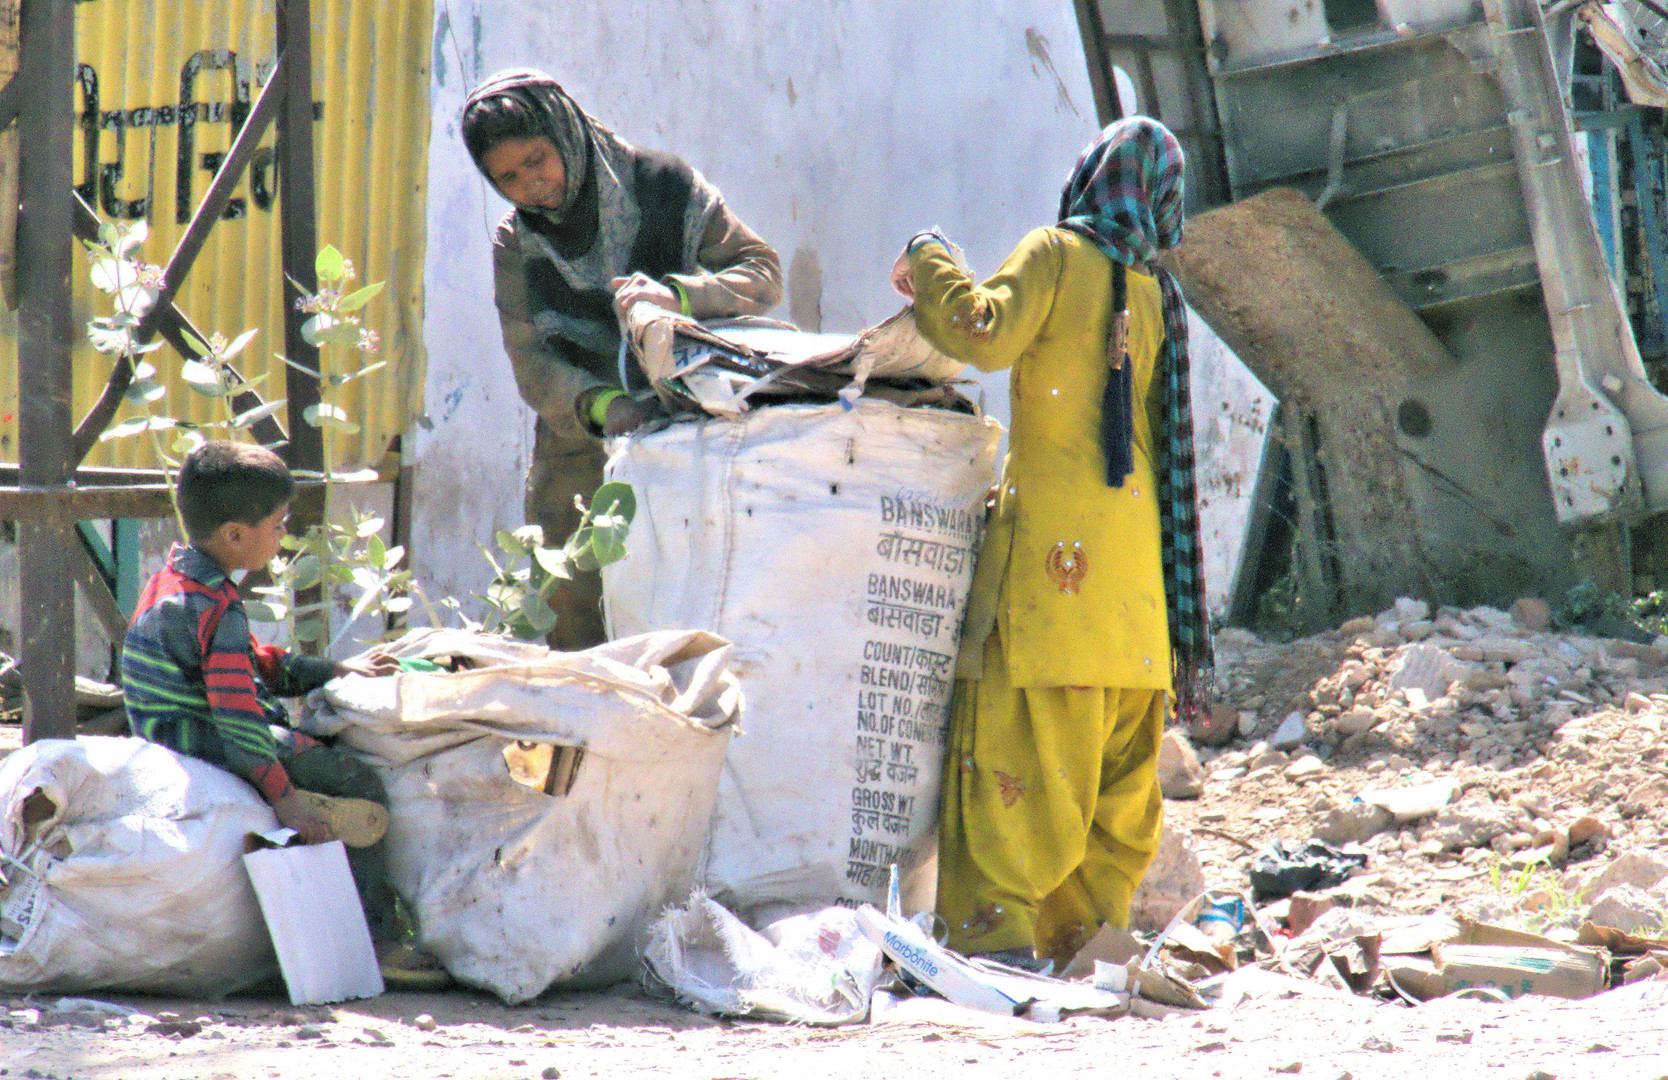 Müllsammlerinnen